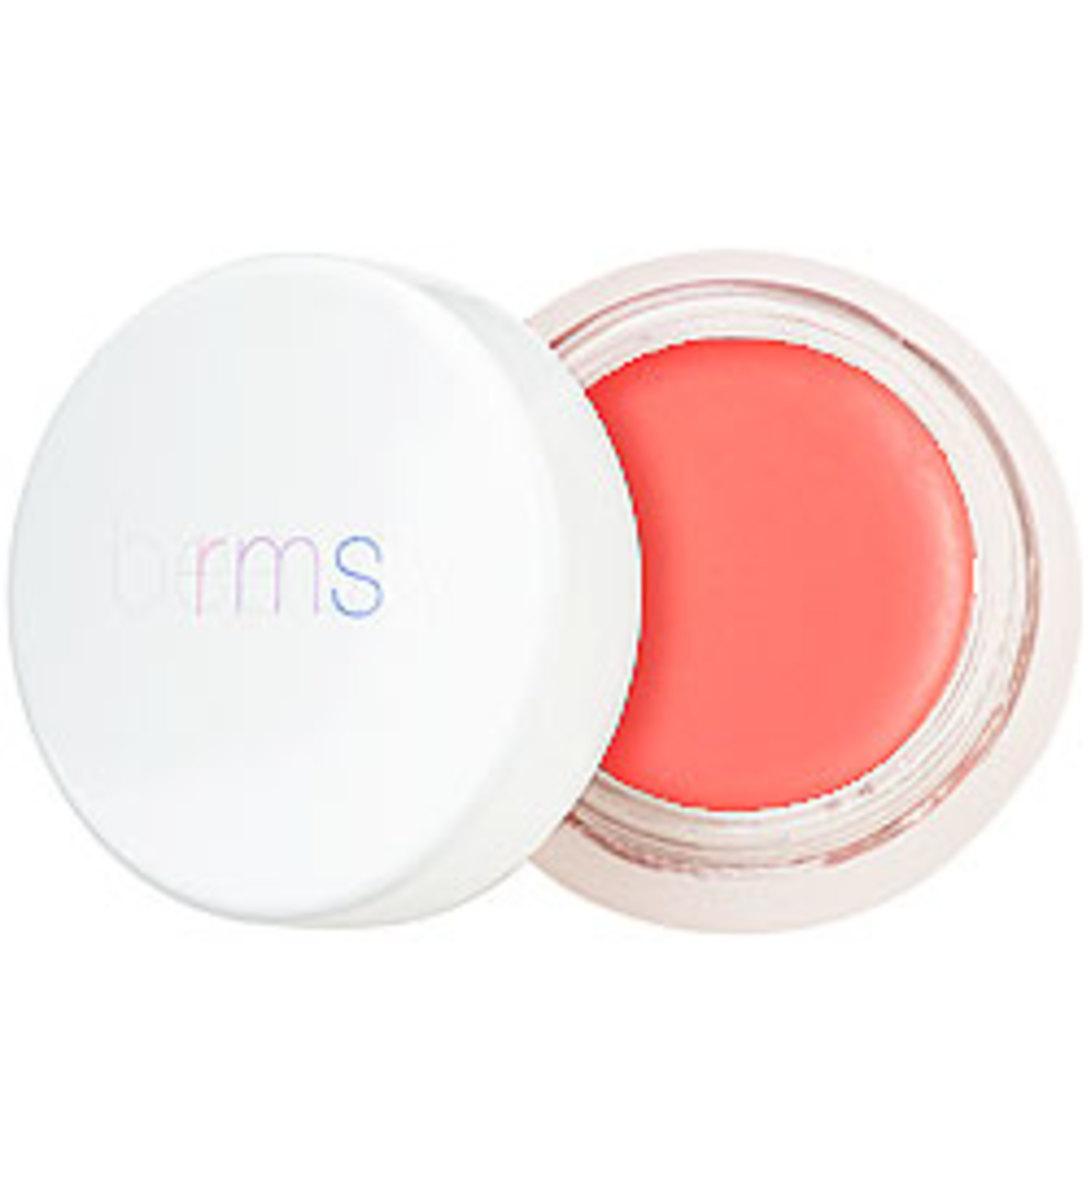 RMS Beauty Lip2Cheek in Smile